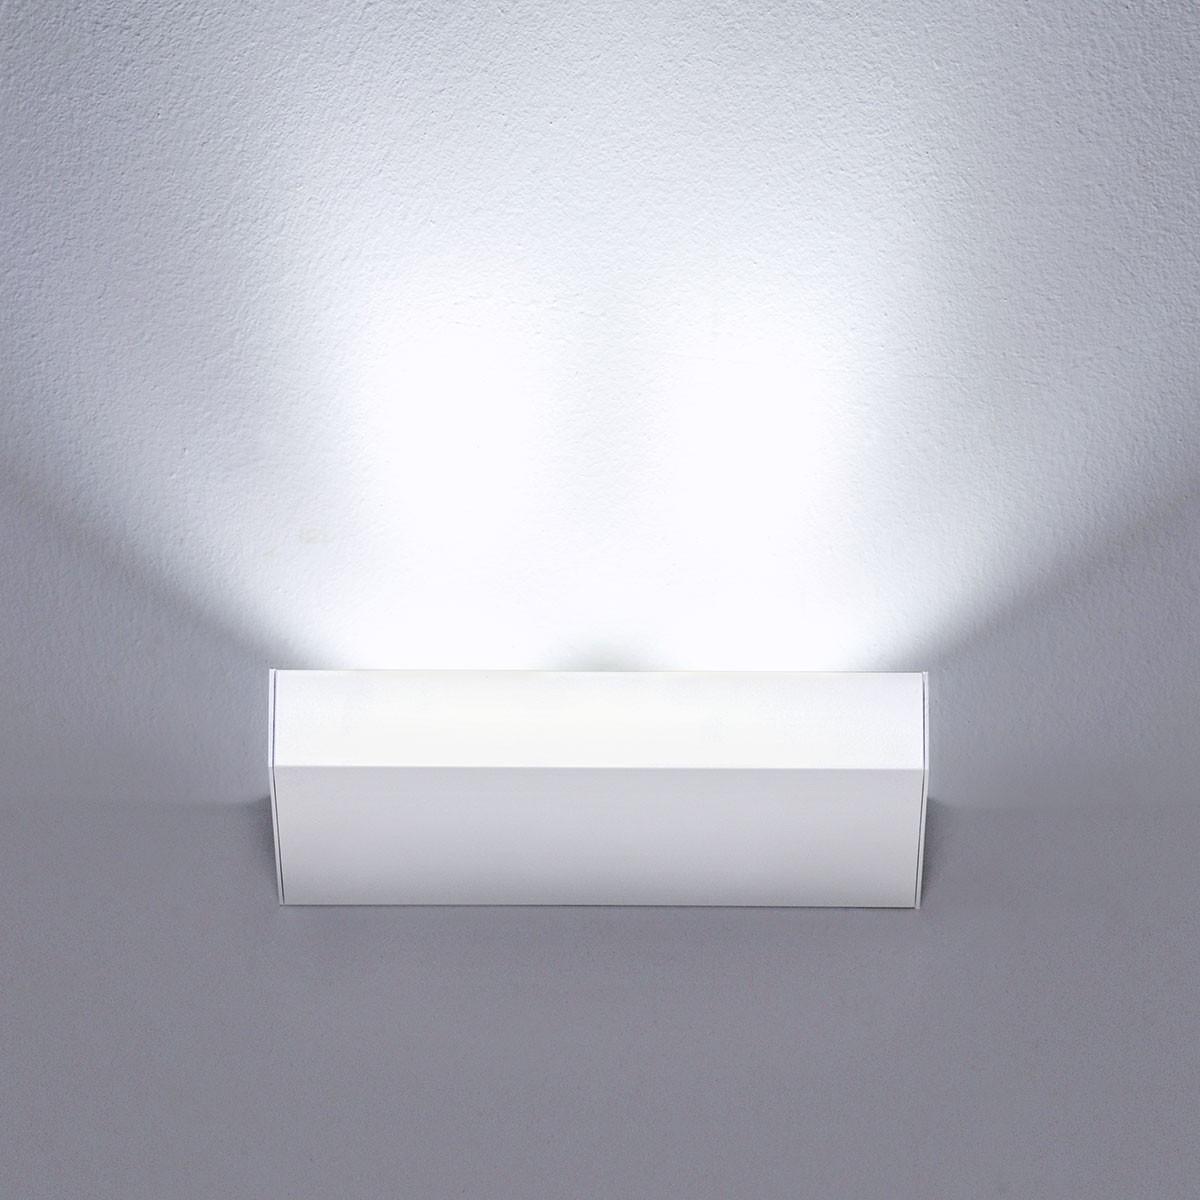 Milan Neva Wandleuchte LED, 2-flg., weiß lackiert